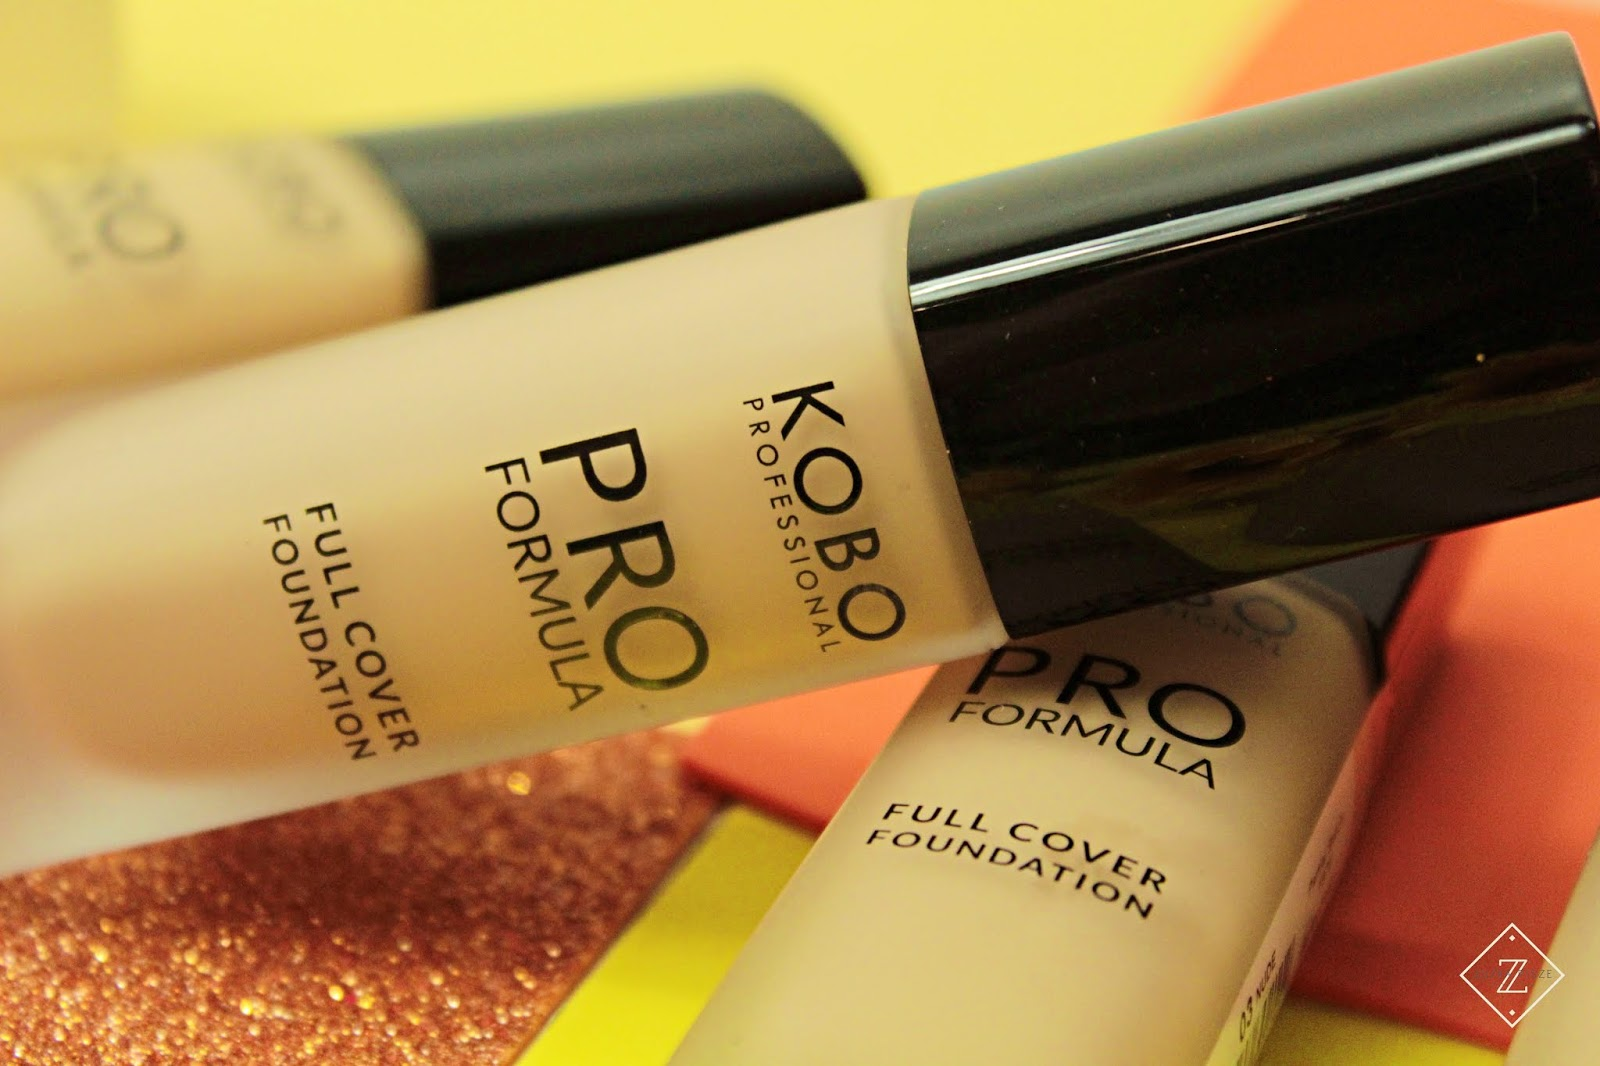 Kobo Professional PRO Formula FULL COVER